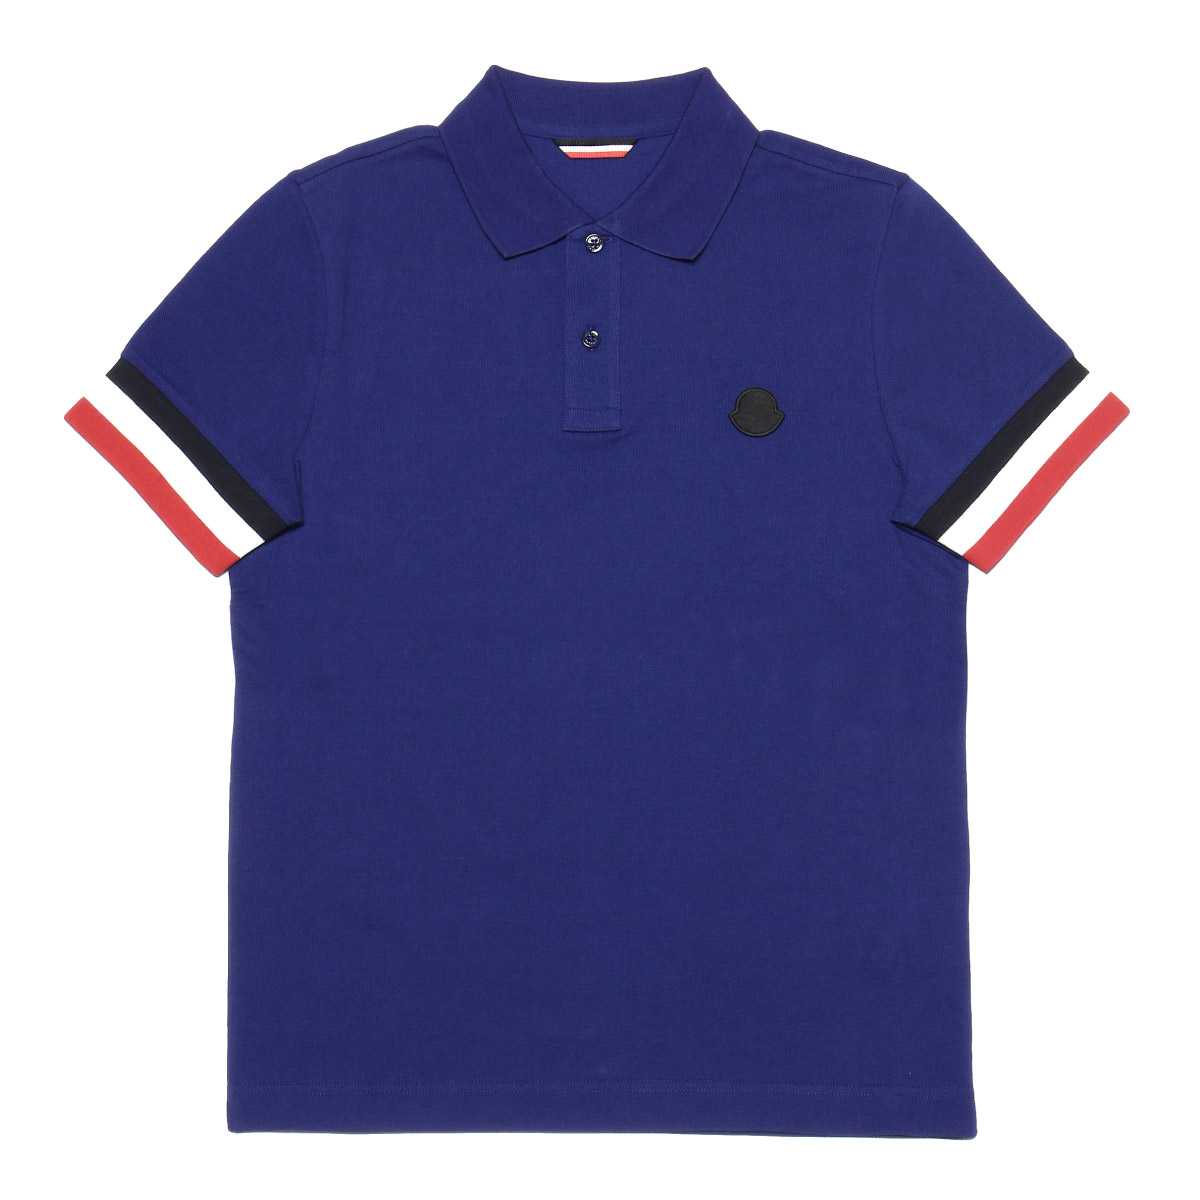 8318400 Monk rail MONCLER polo shirt men 84556 76A short sleeves polo shirt BLUE blue